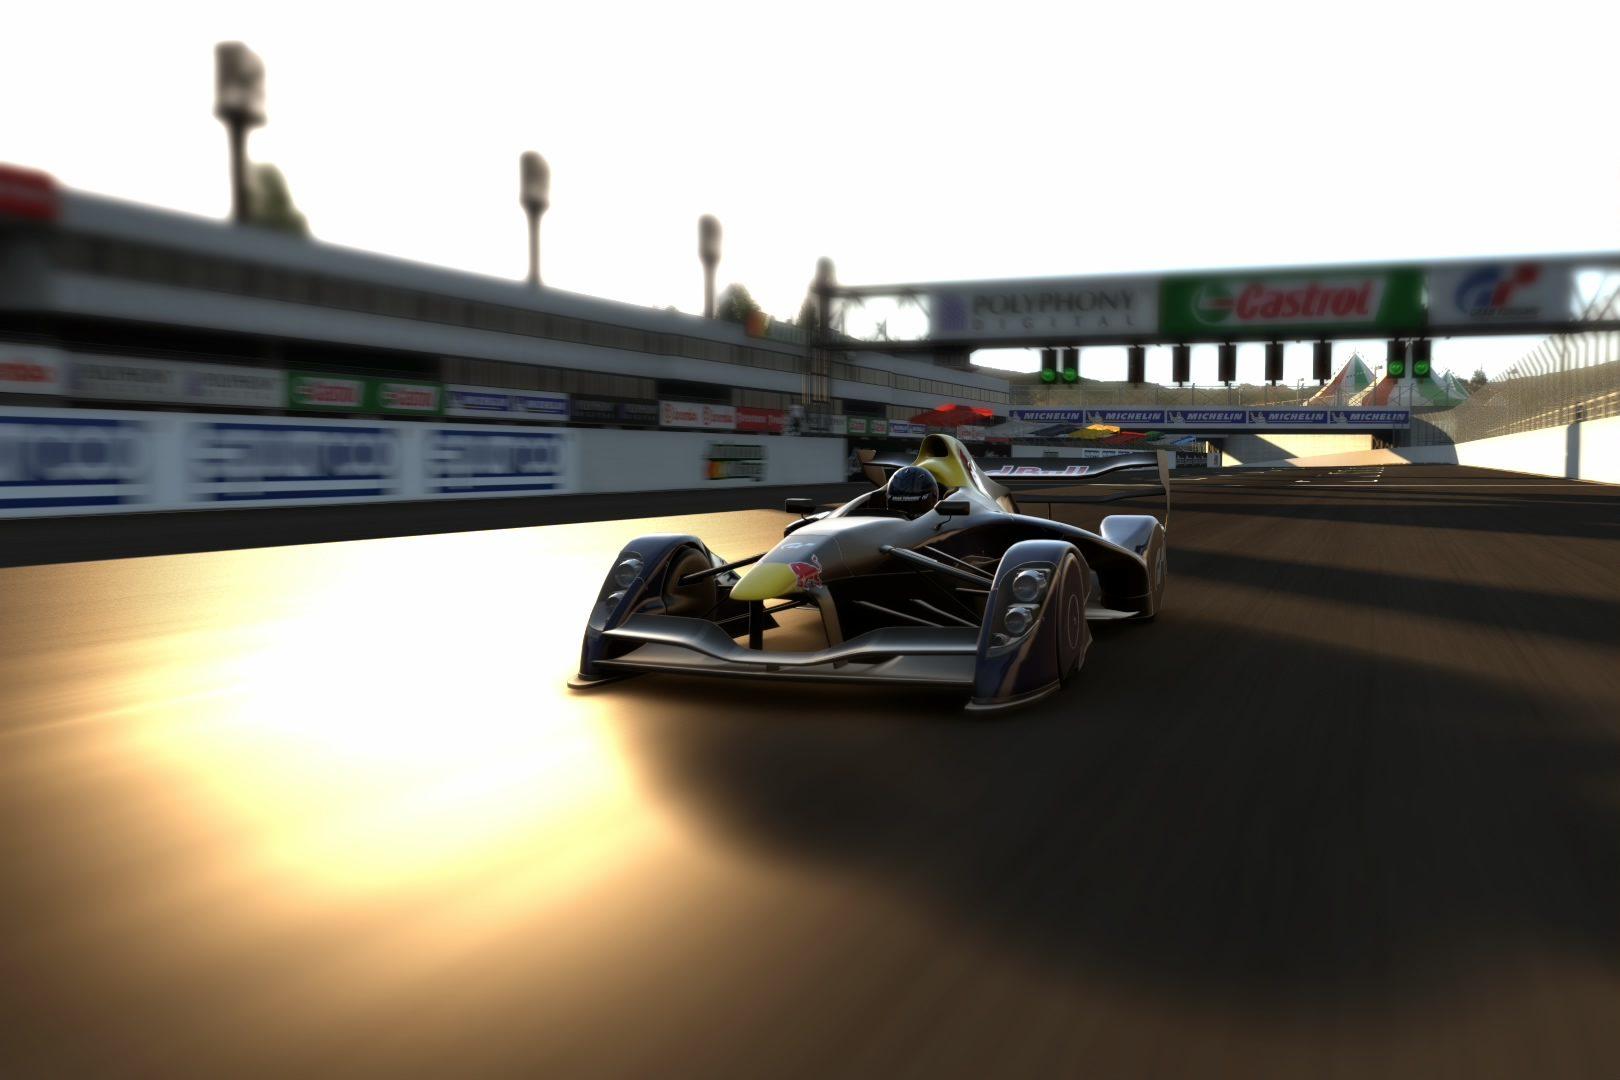 Red Bull X2014 Junior (Car).jpg